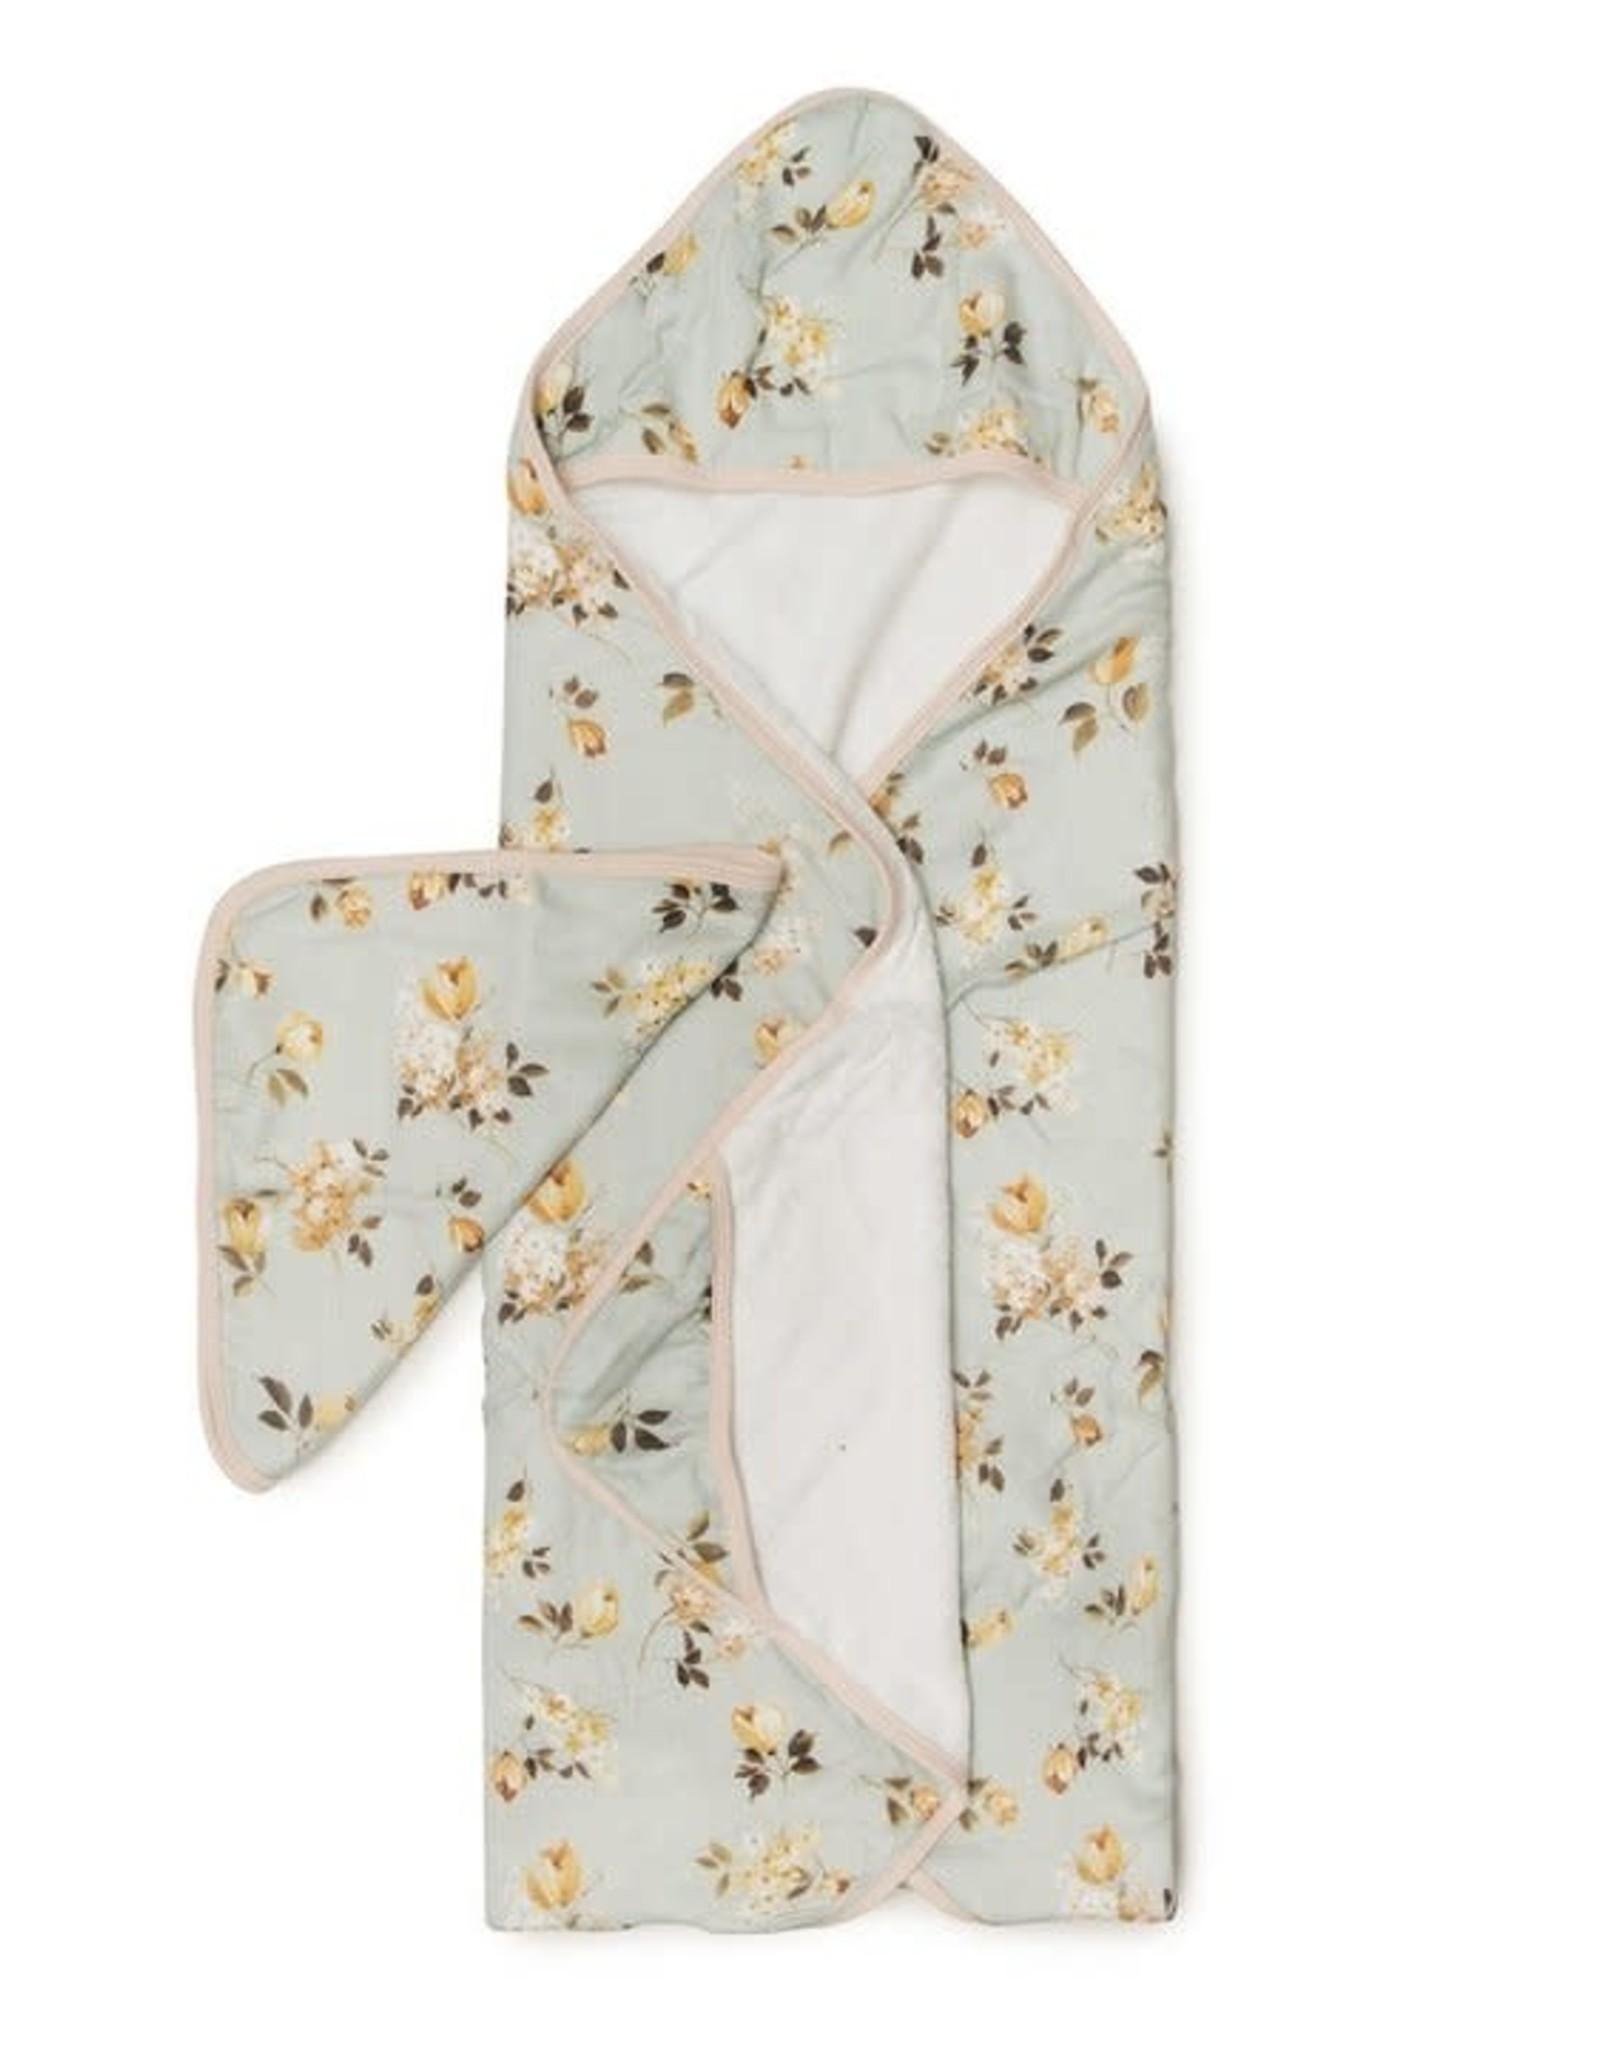 Loulou Lollipop Hooded Towel Set - Rose Wild